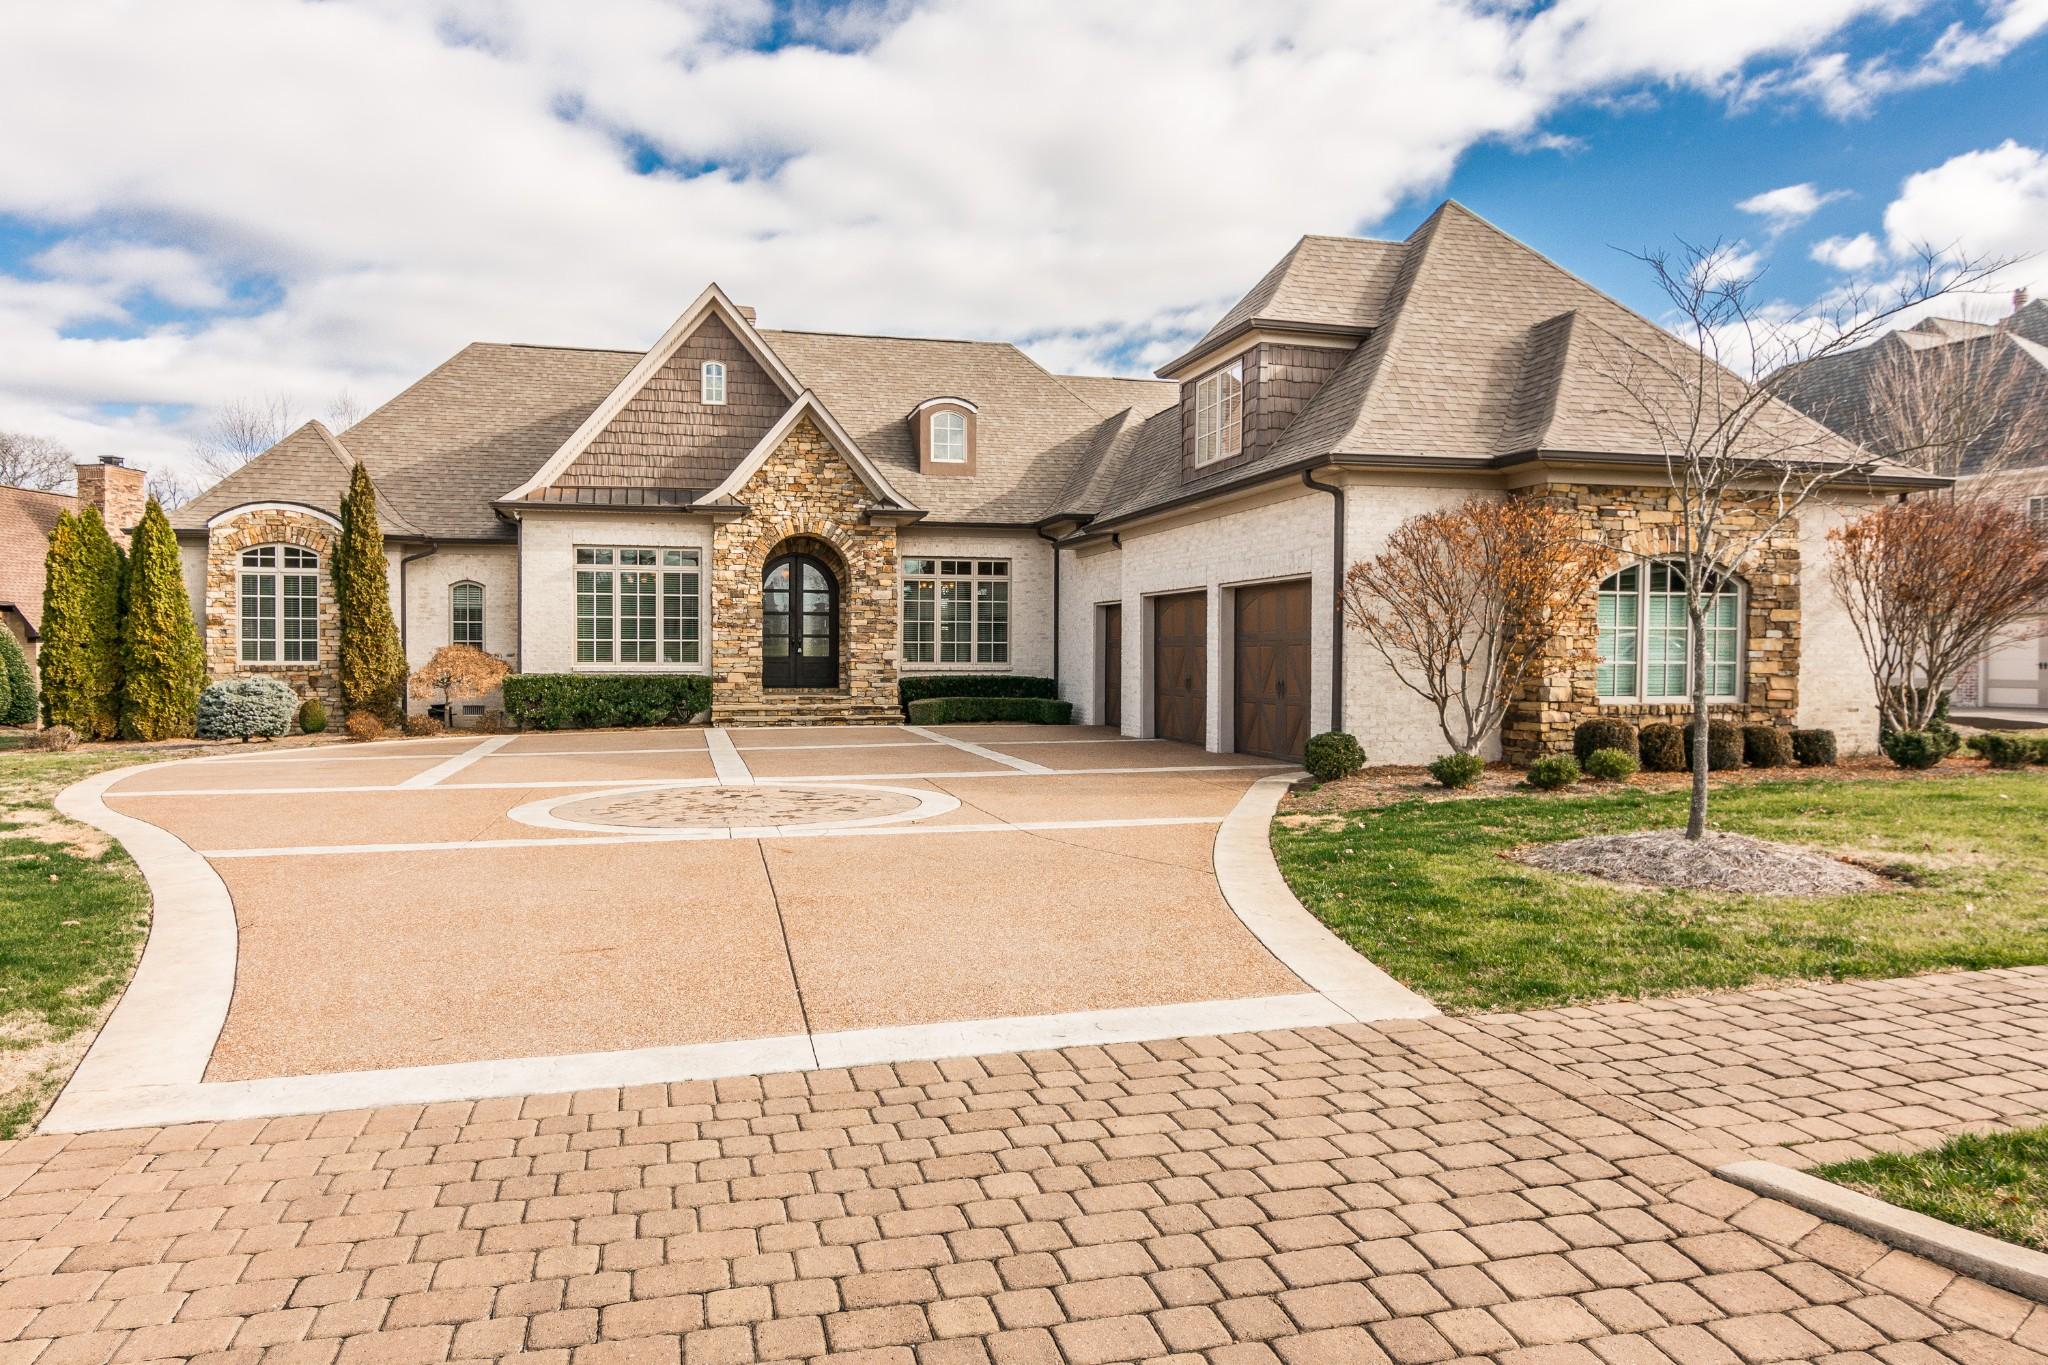 $1,850,000 - 3Br/4Ba -  for Sale in Fairvue Ph 7, Gallatin